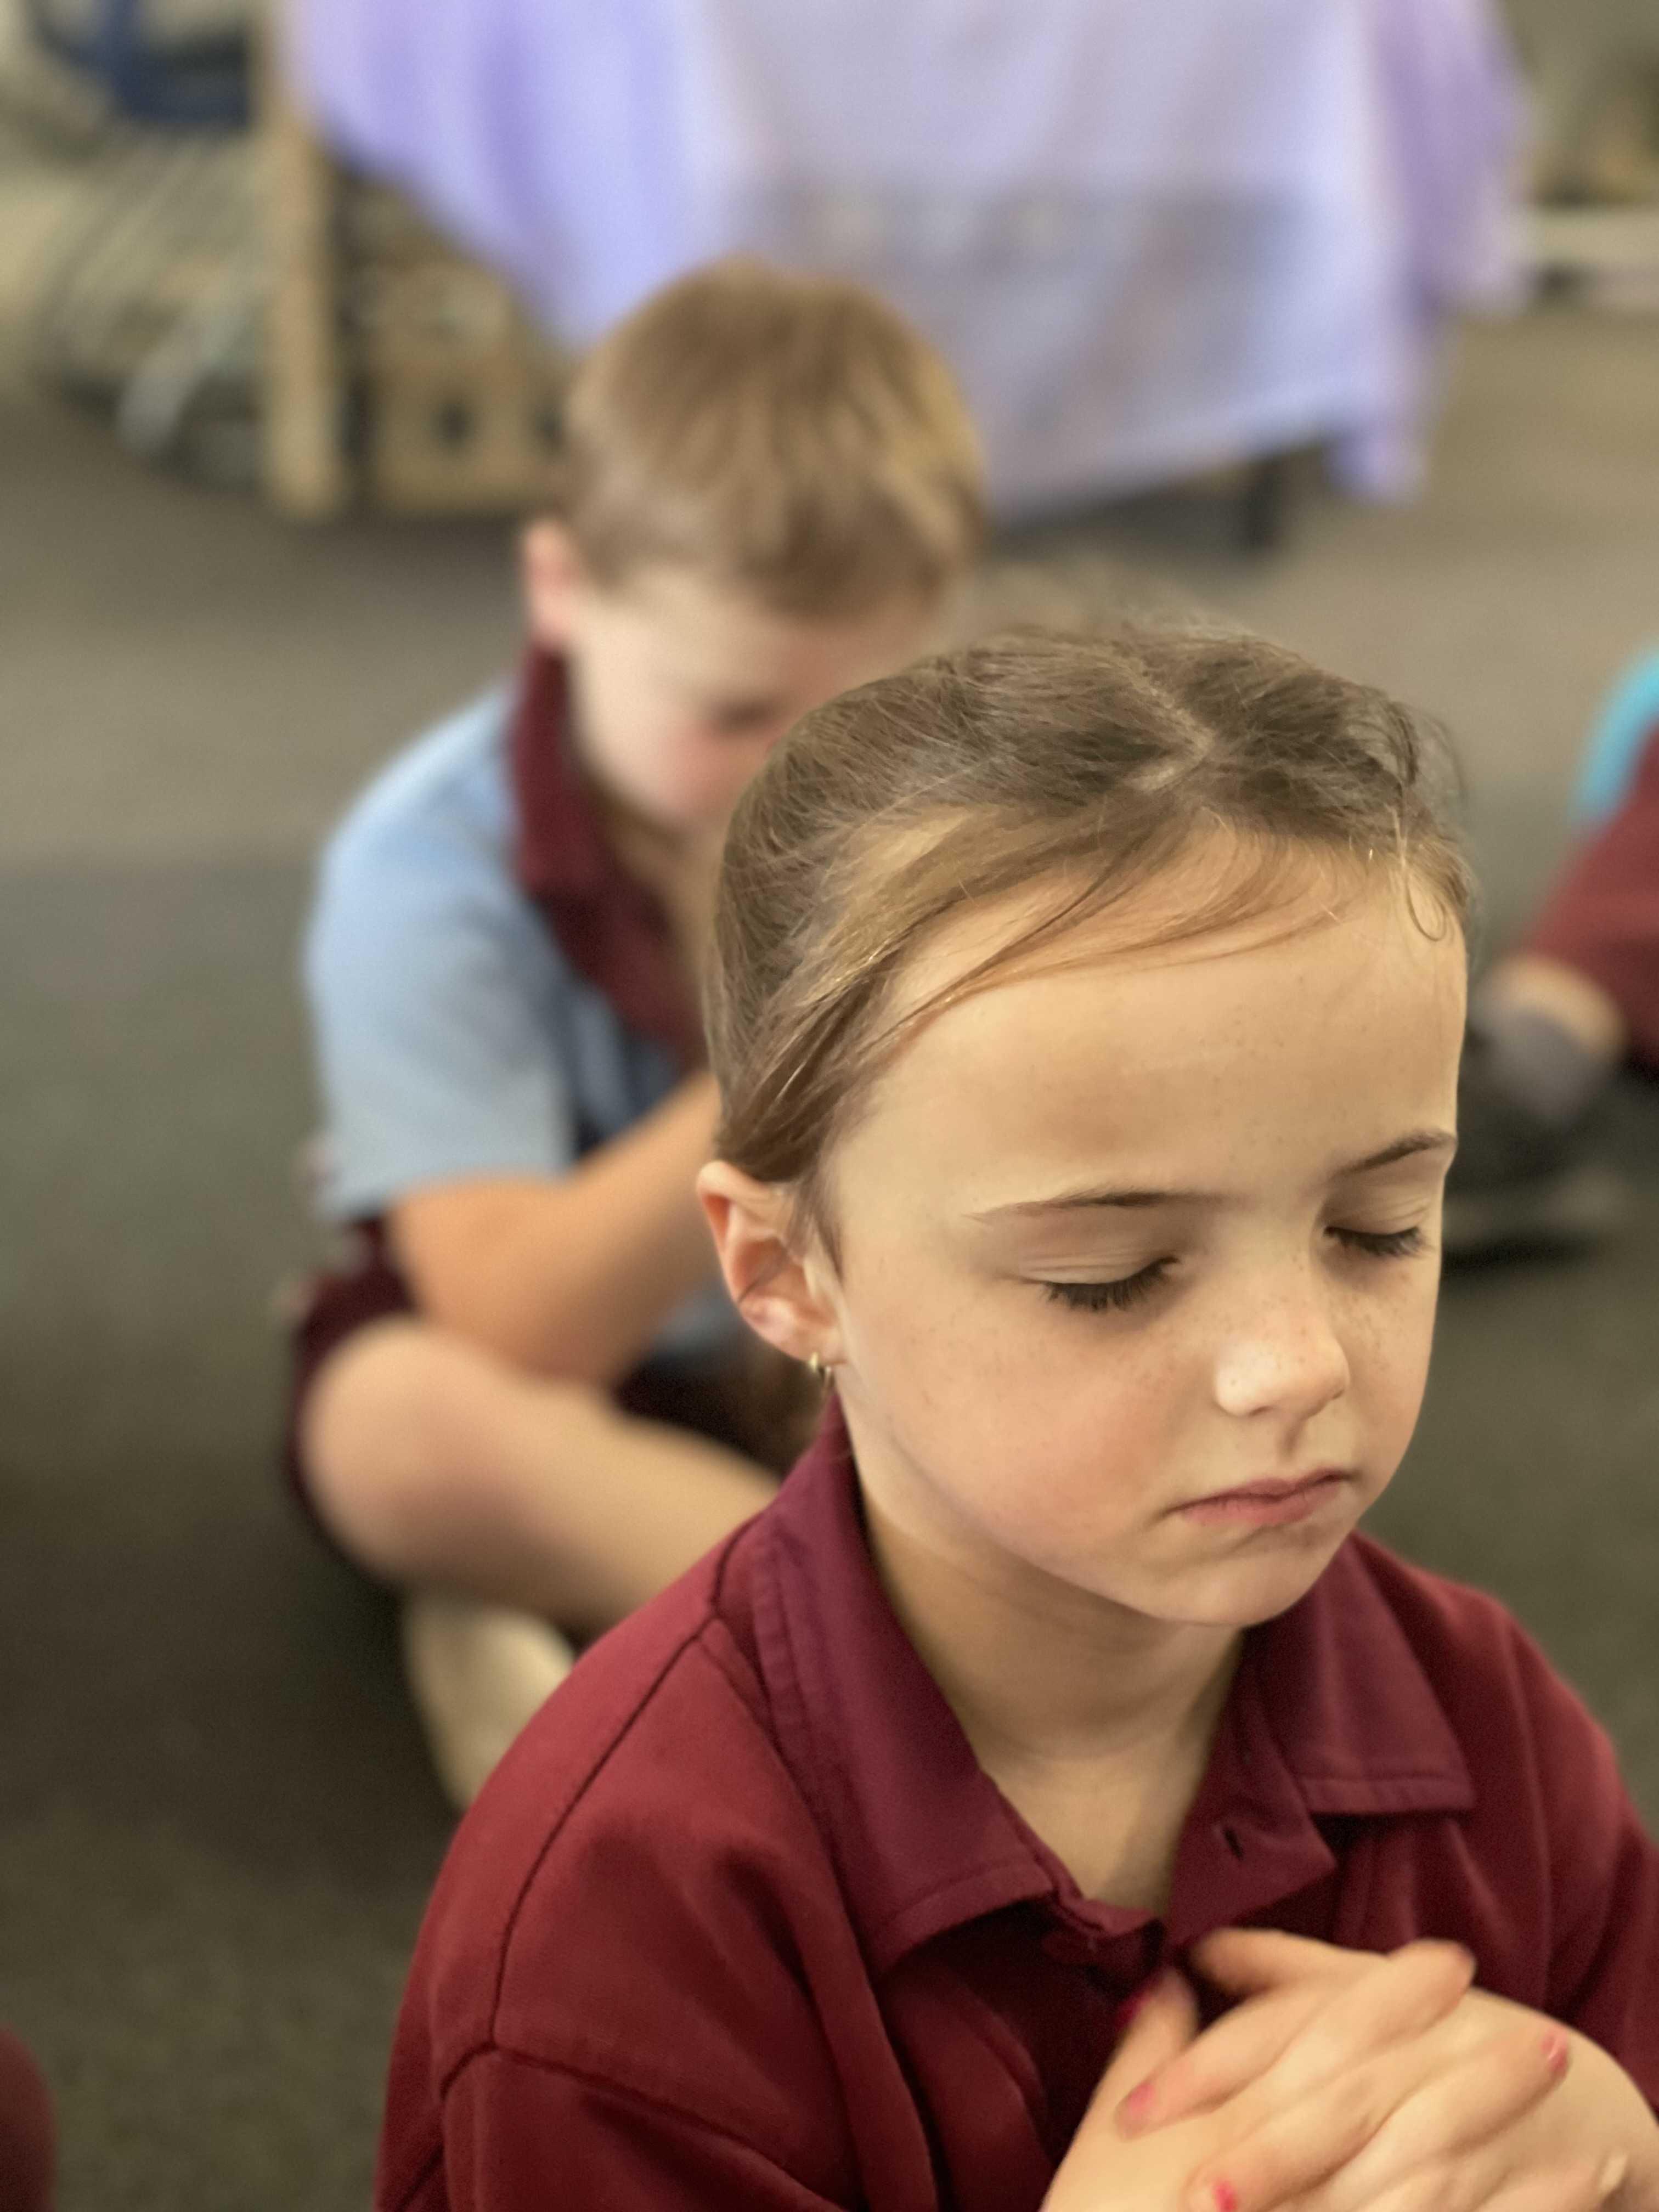 Student_meditating